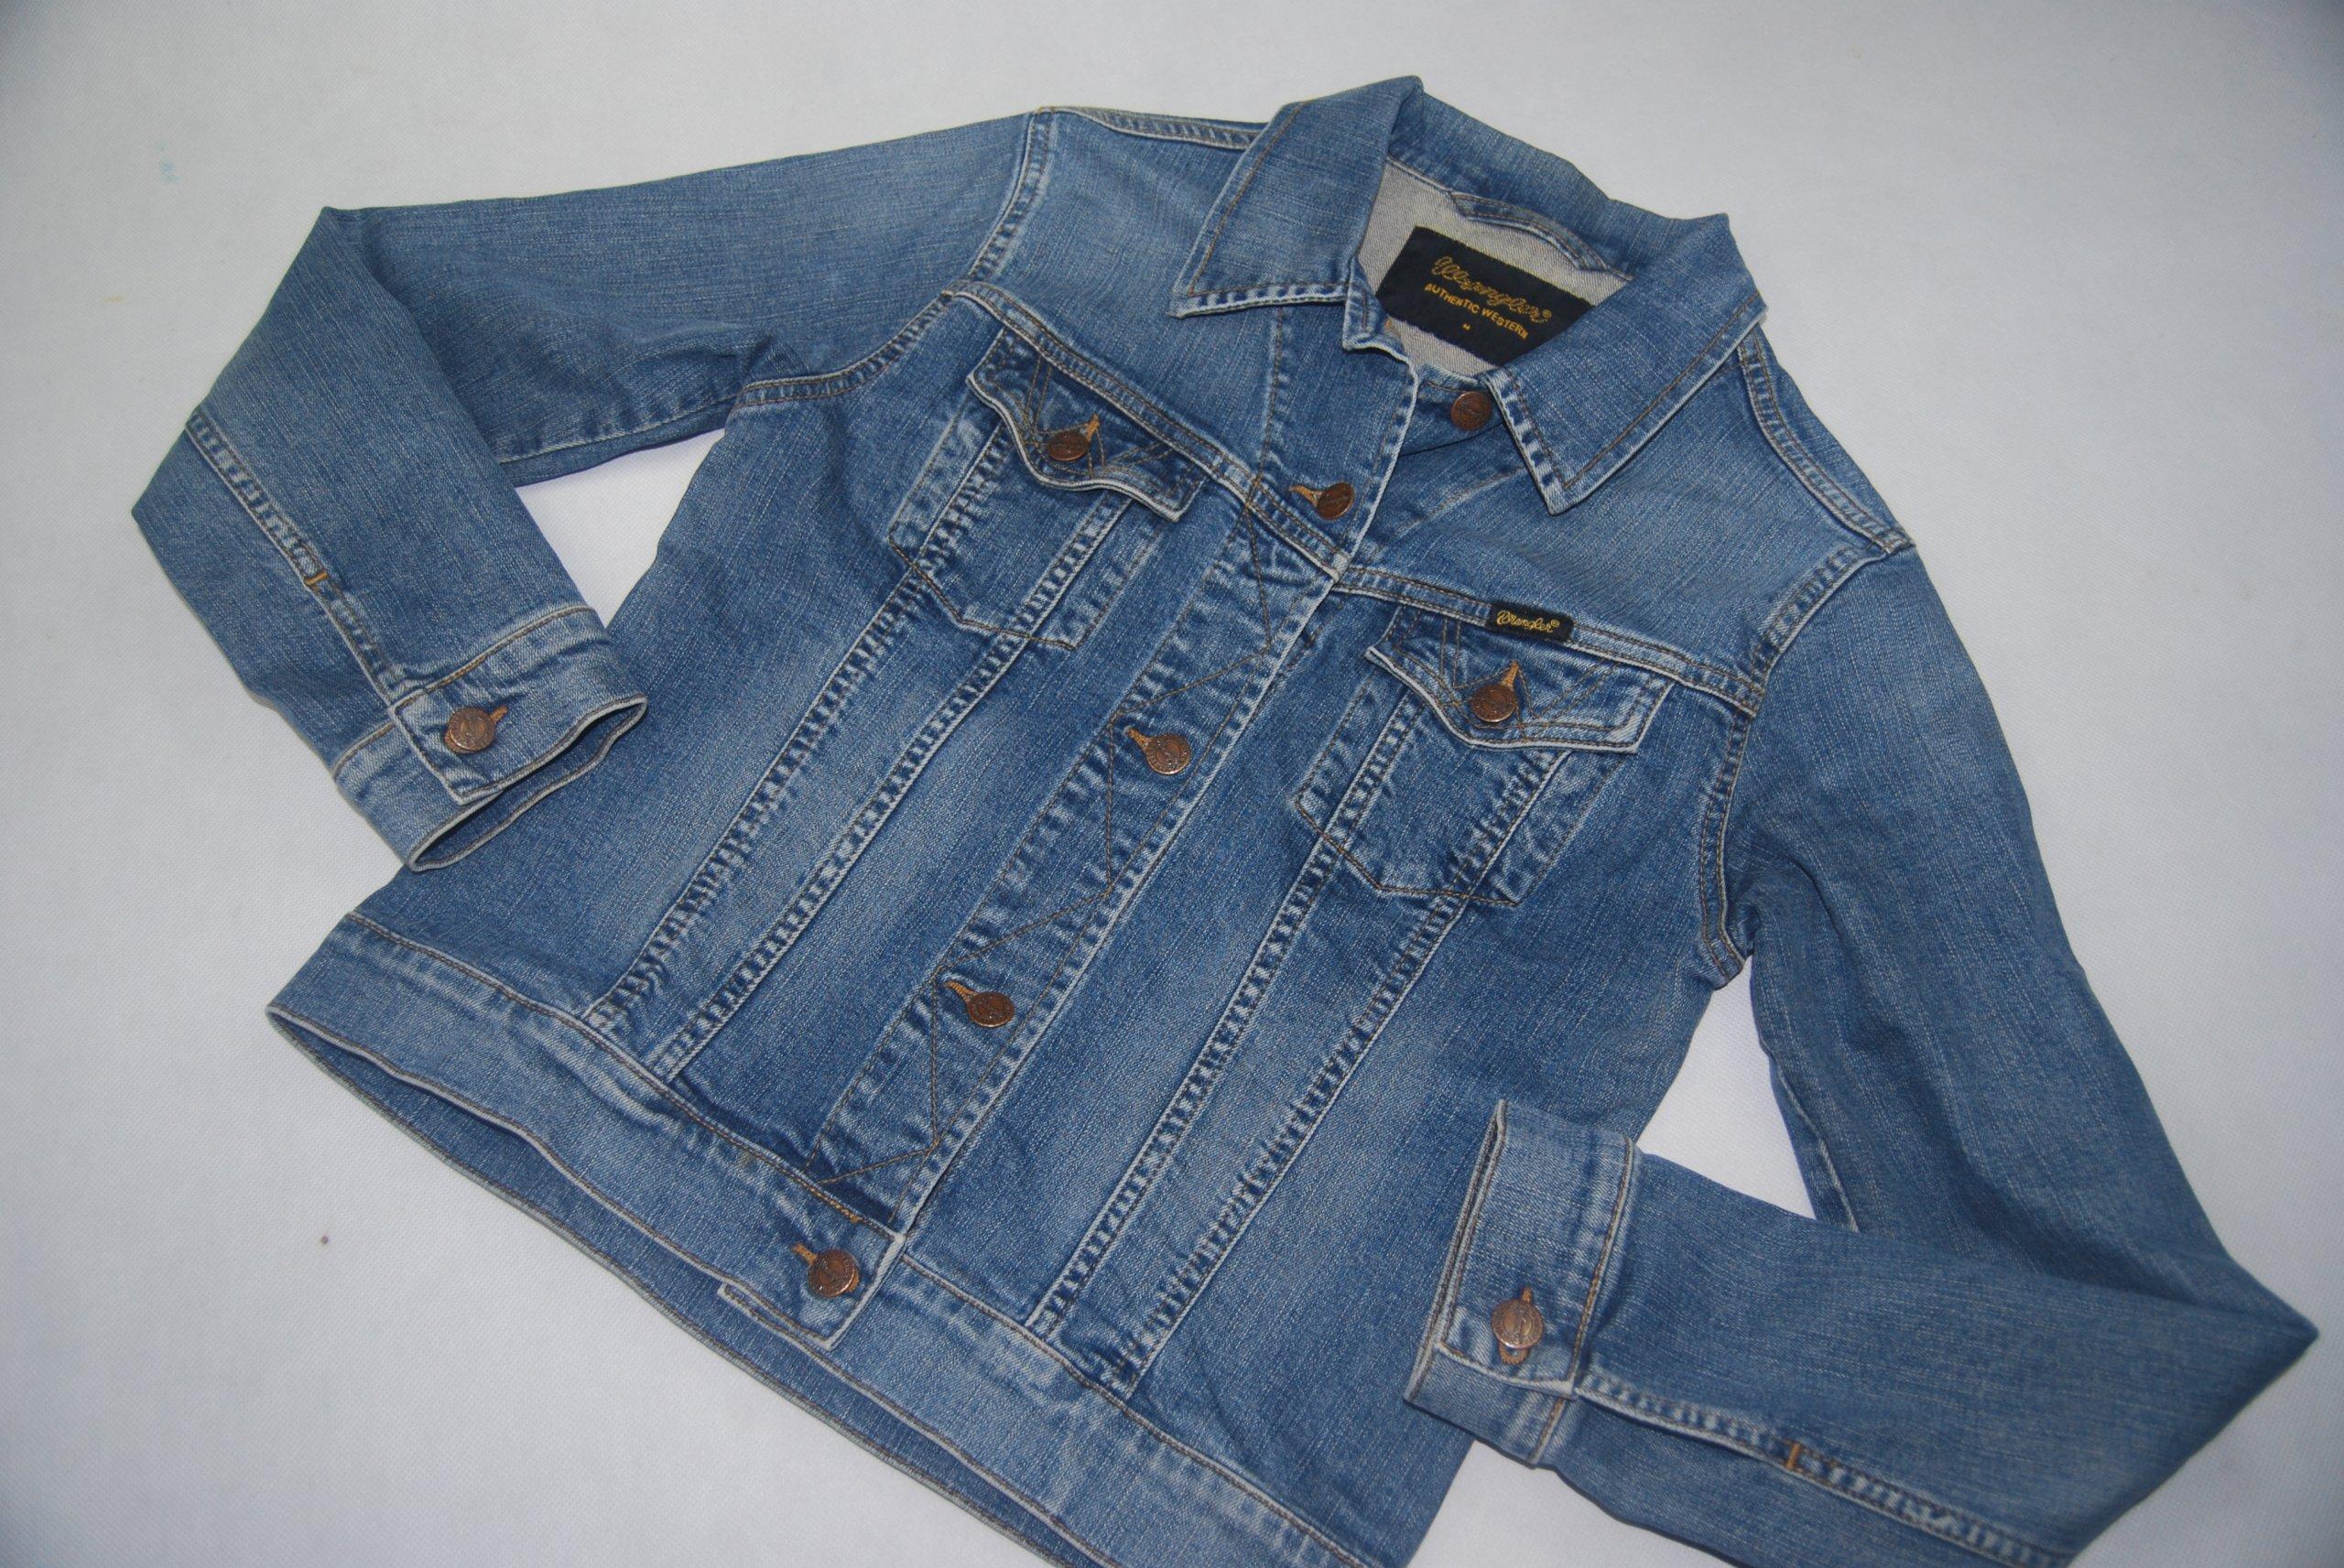 0125bc8f Wrangler Autentic Western kurtka jeansowa katana M - 7364174364 ...